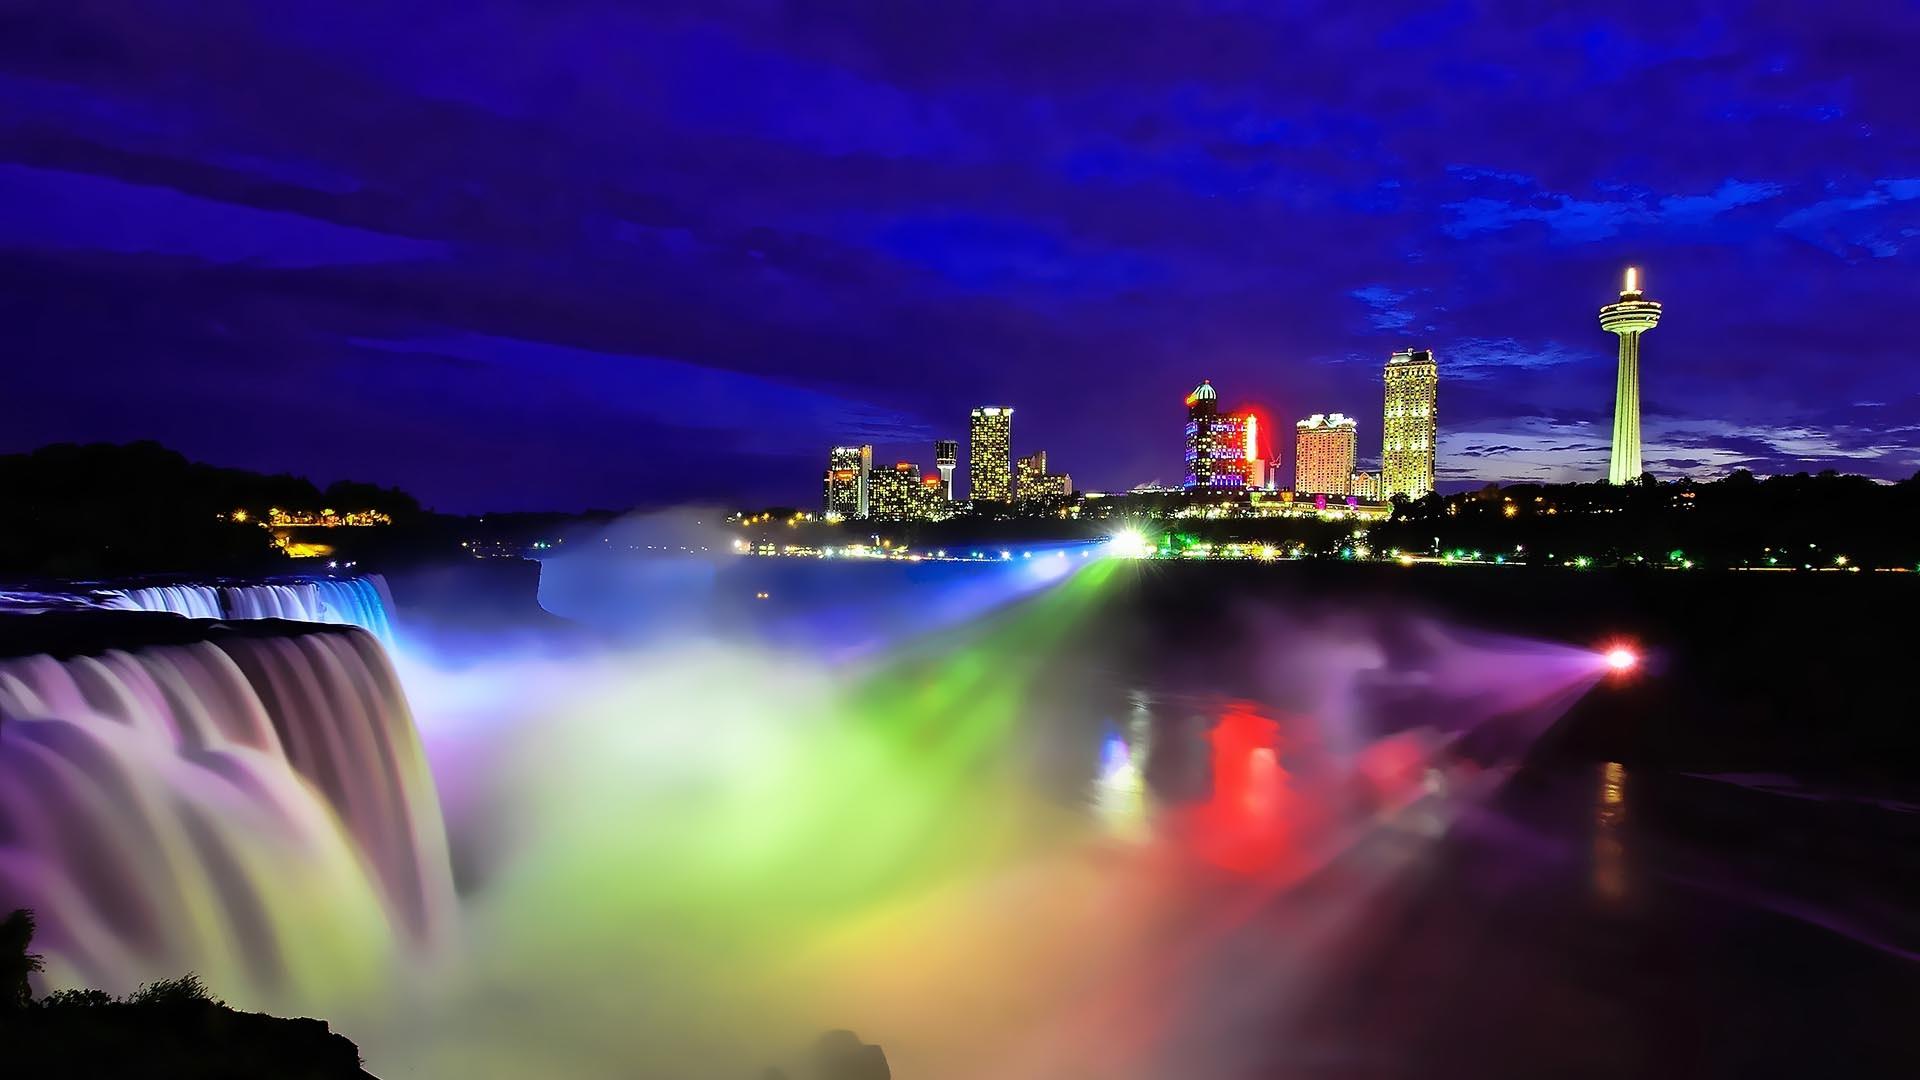 Download Wallpaper Night Colorful - Niagara-Falls-night-view-Canada-colorful-light-city_1920x1080  Image.jpg